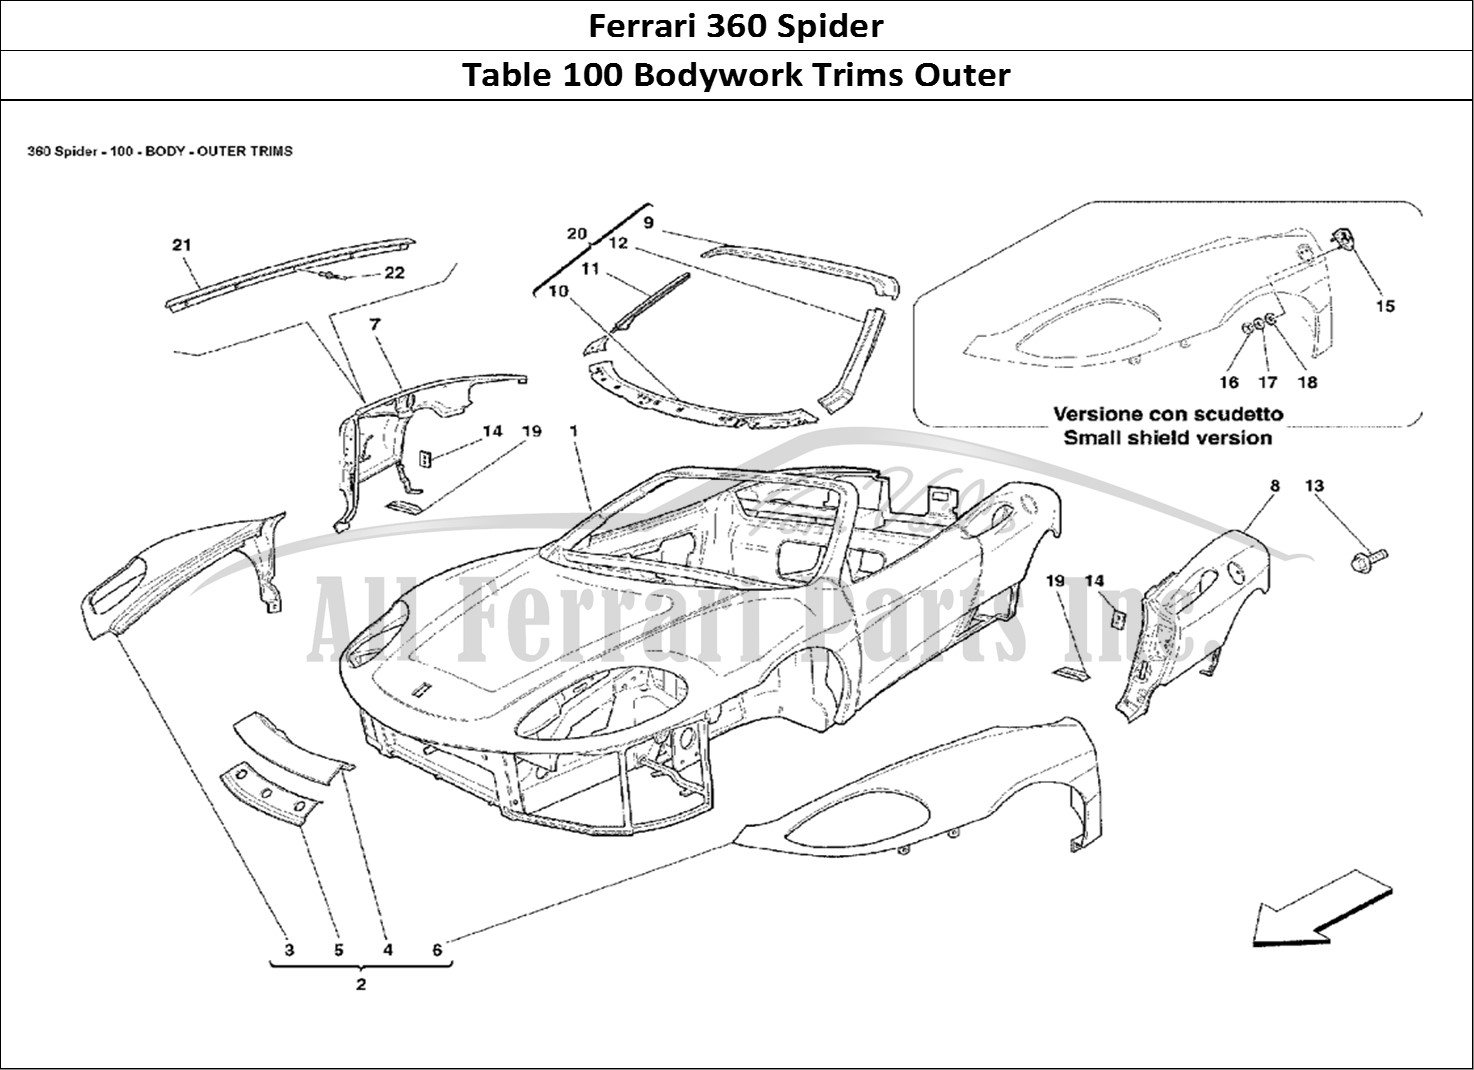 buy original ferrari 360 spider 100 bodywork trims outer ferrari parts  spares  accessories online